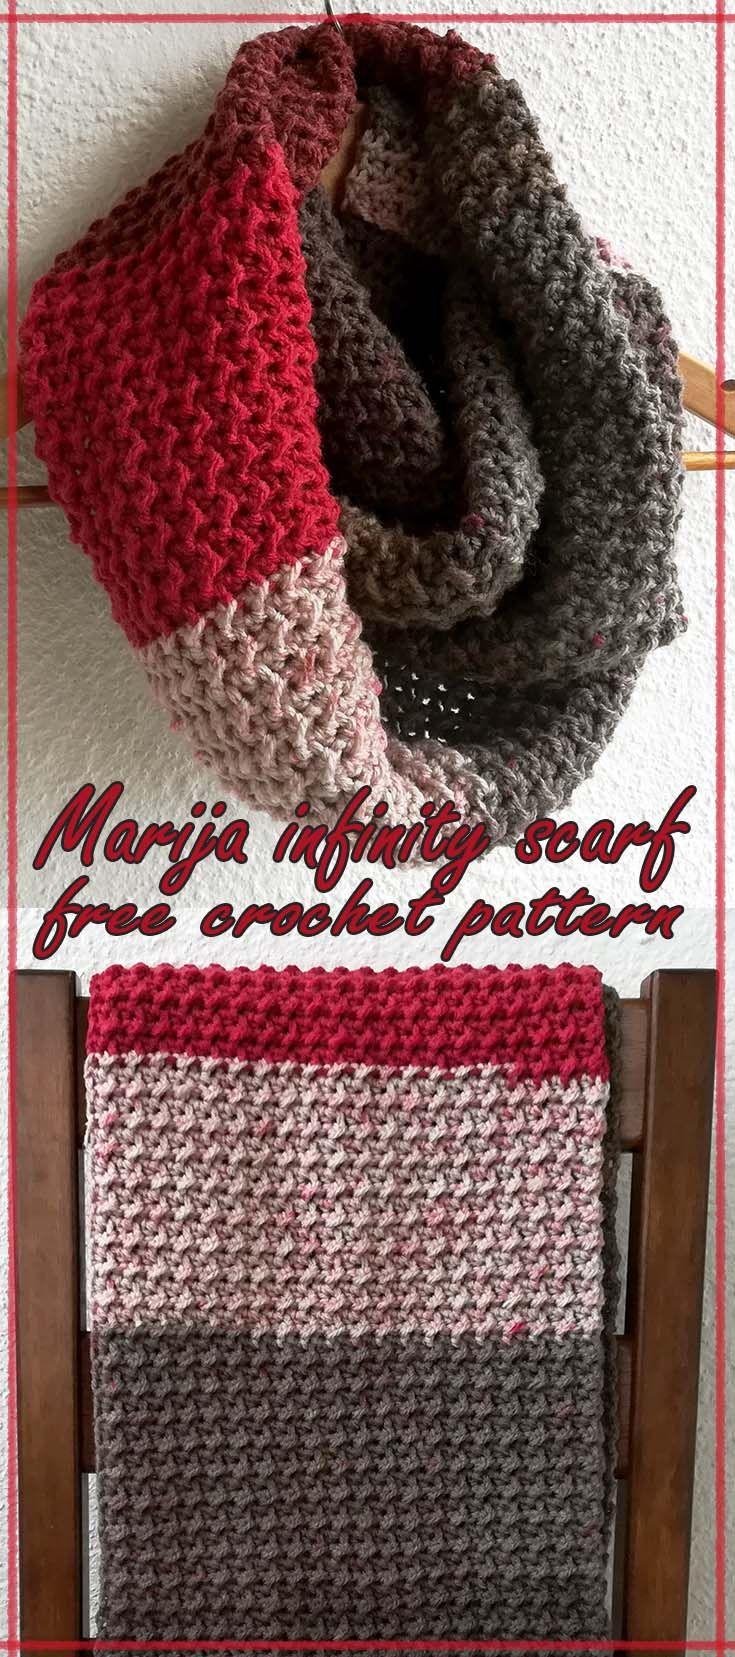 12 MakiCrochet patterns ideas   crochet patterns, crochet, crochet ...